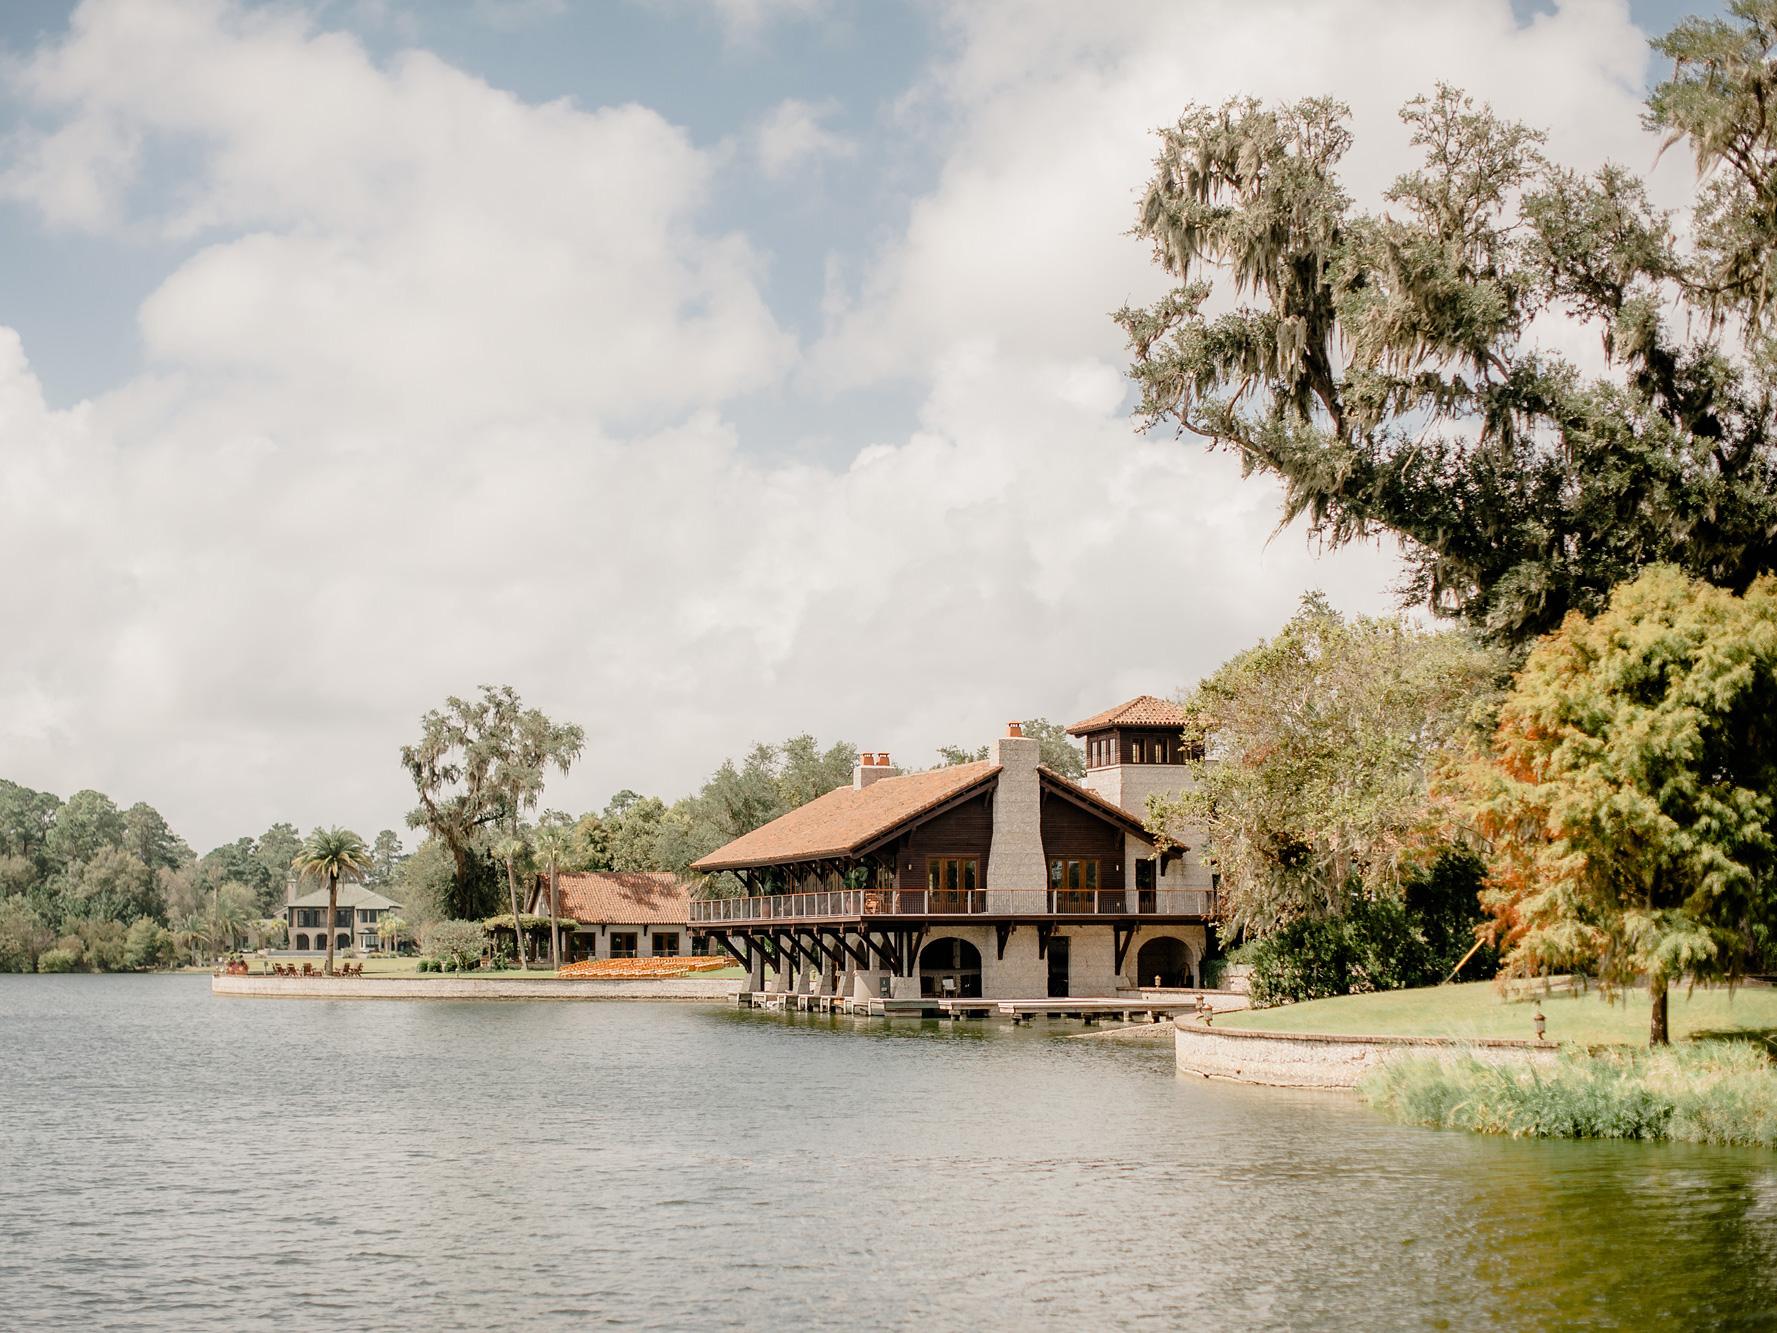 21frederica_boathouse.jpg